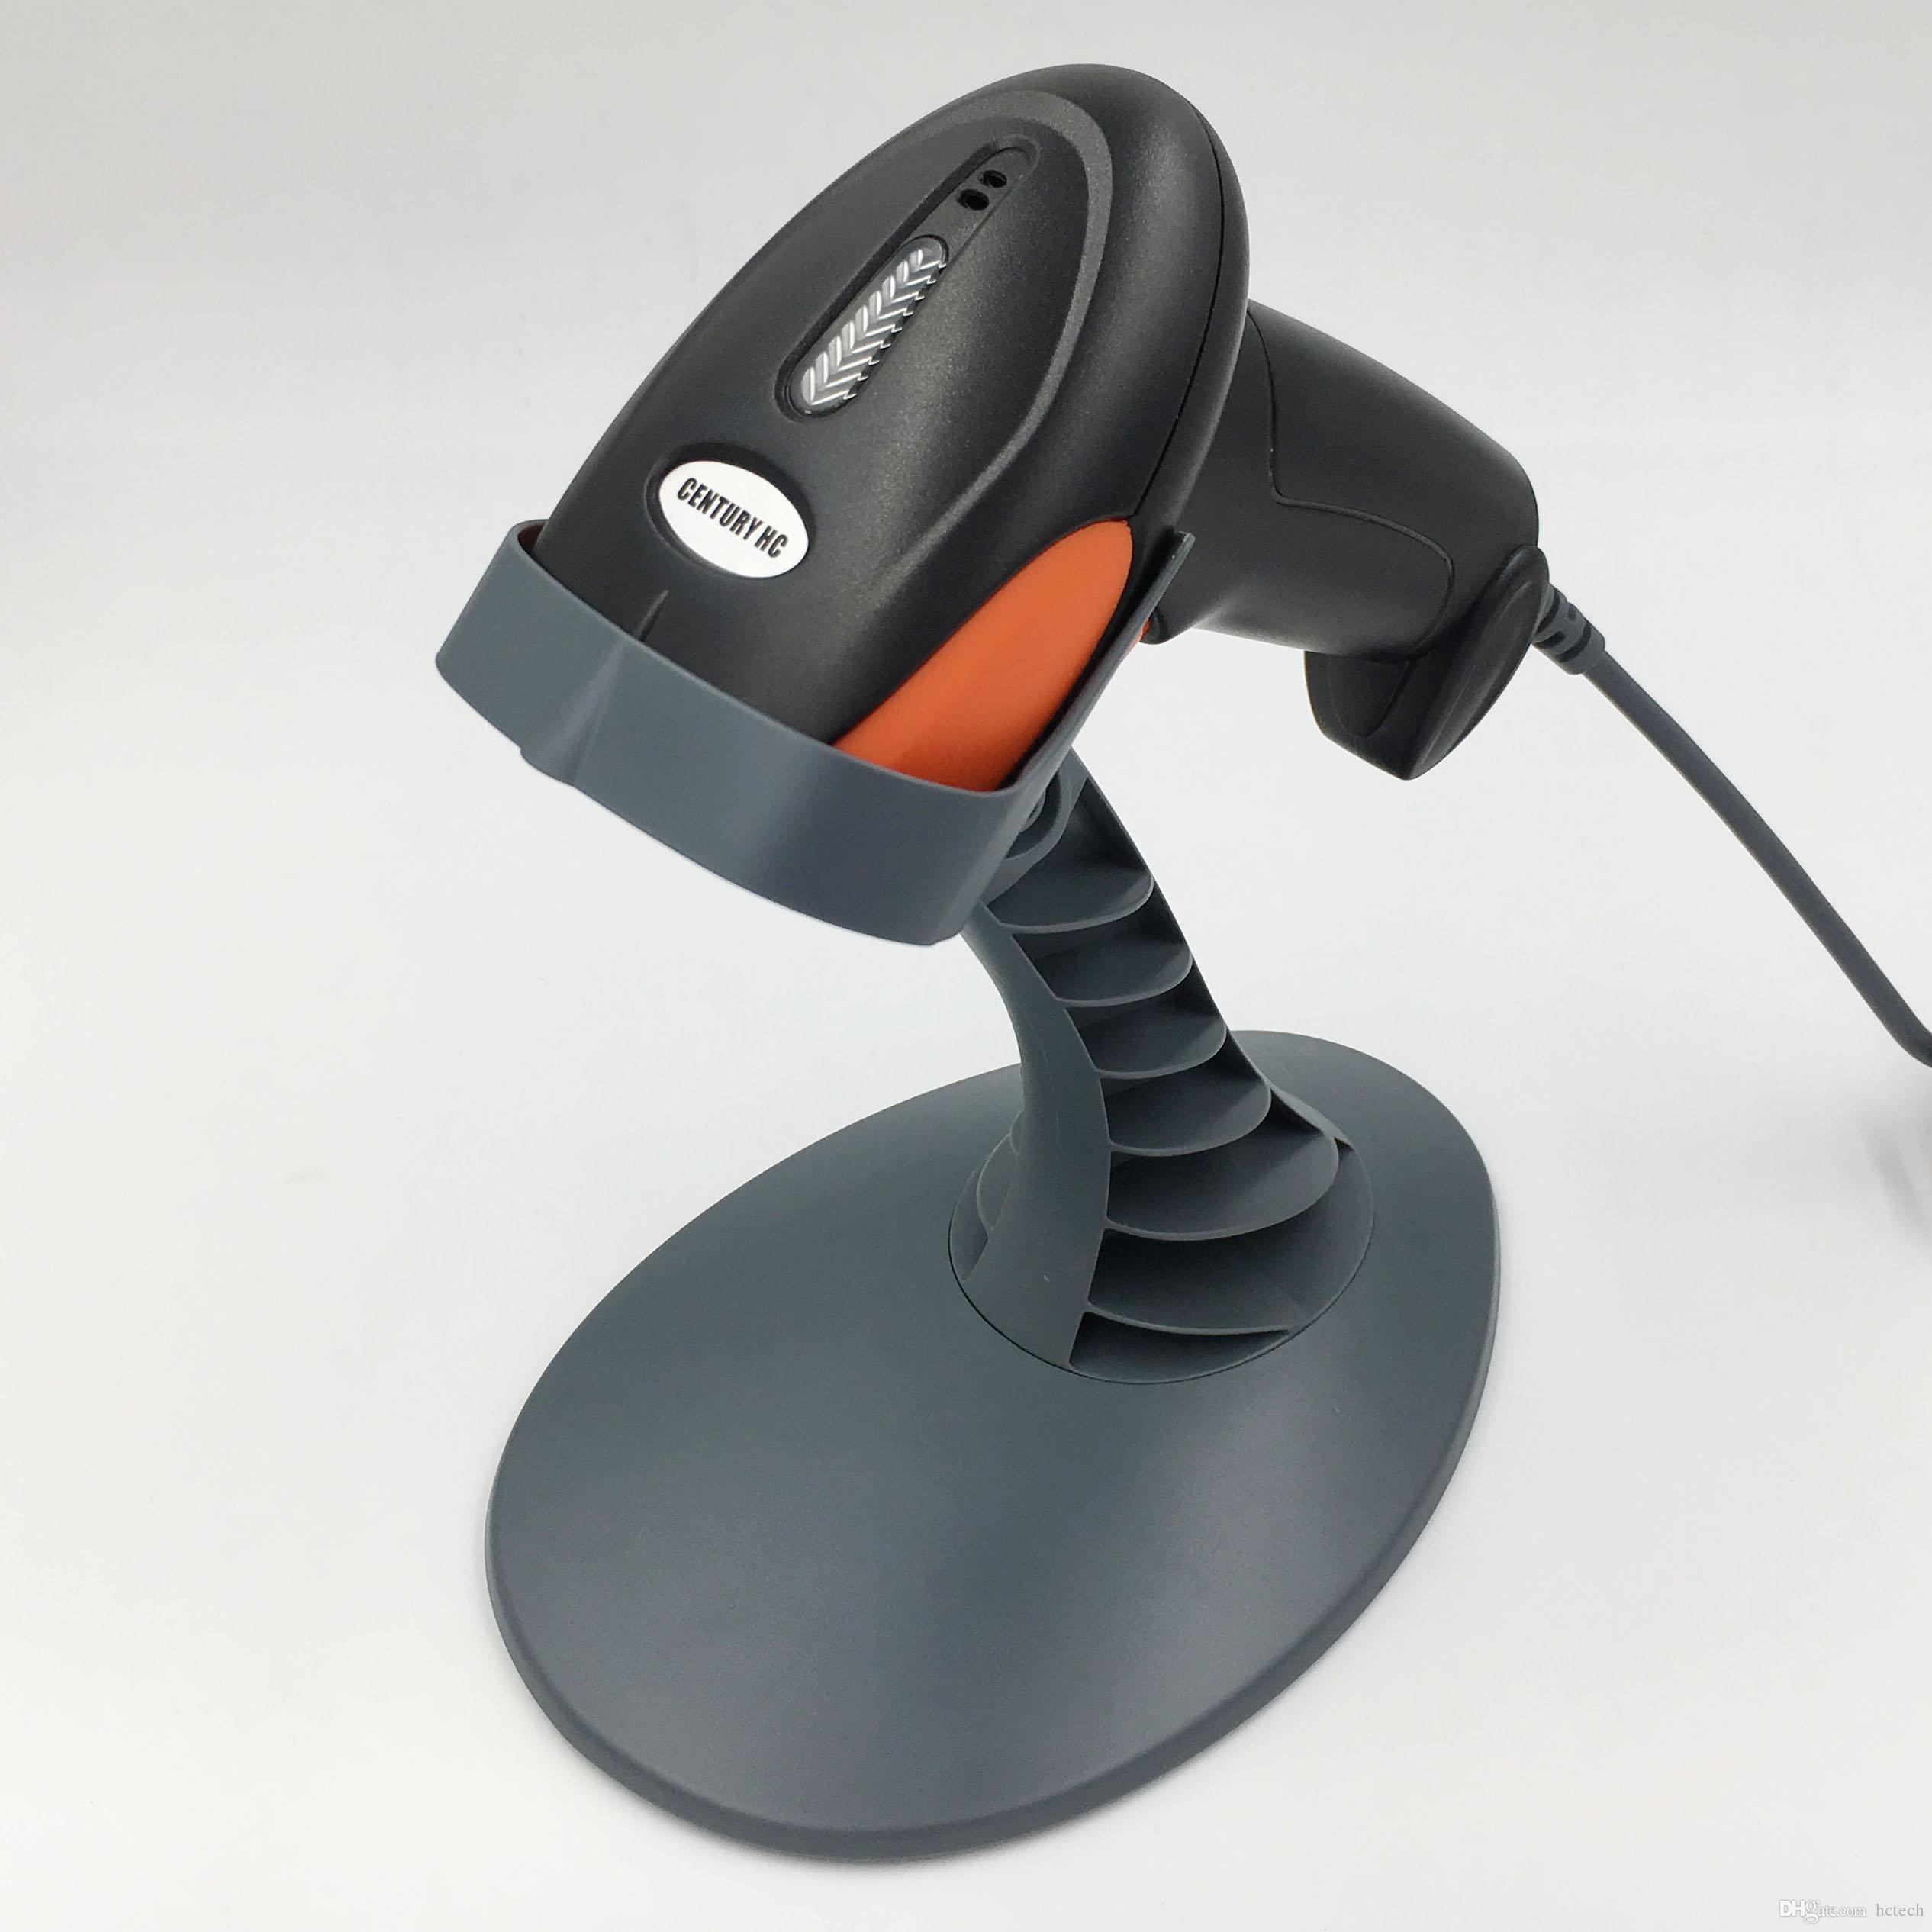 BSWNI-5110 핸드 헬드 COMS 2d 바코드 스캐너 판매